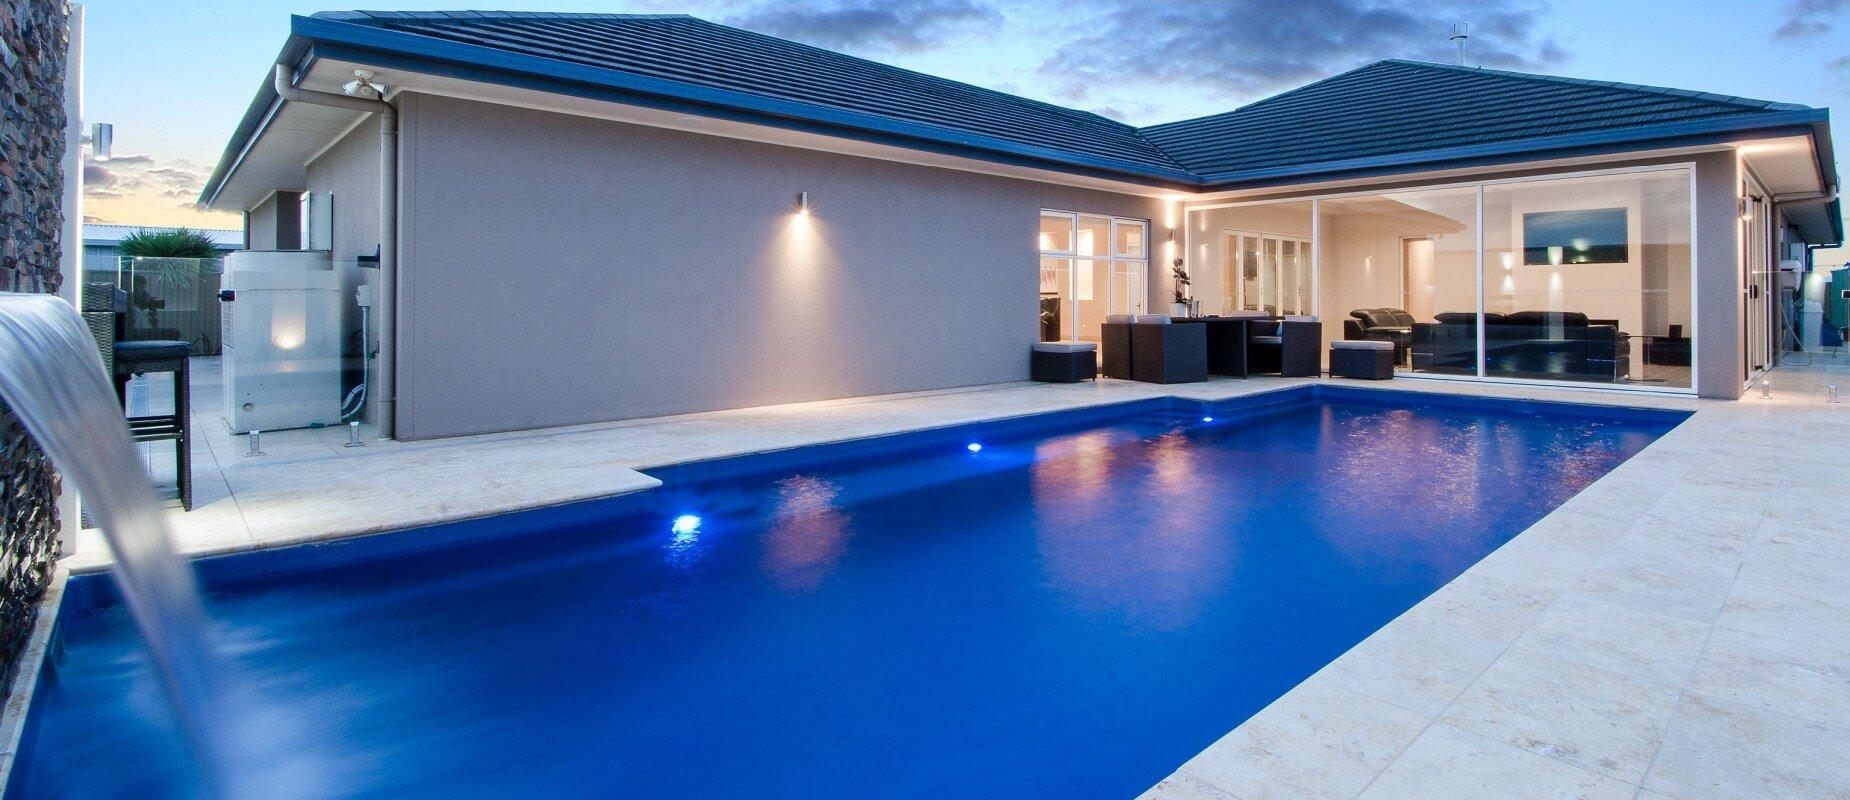 piscina de lux modele frumoase 14